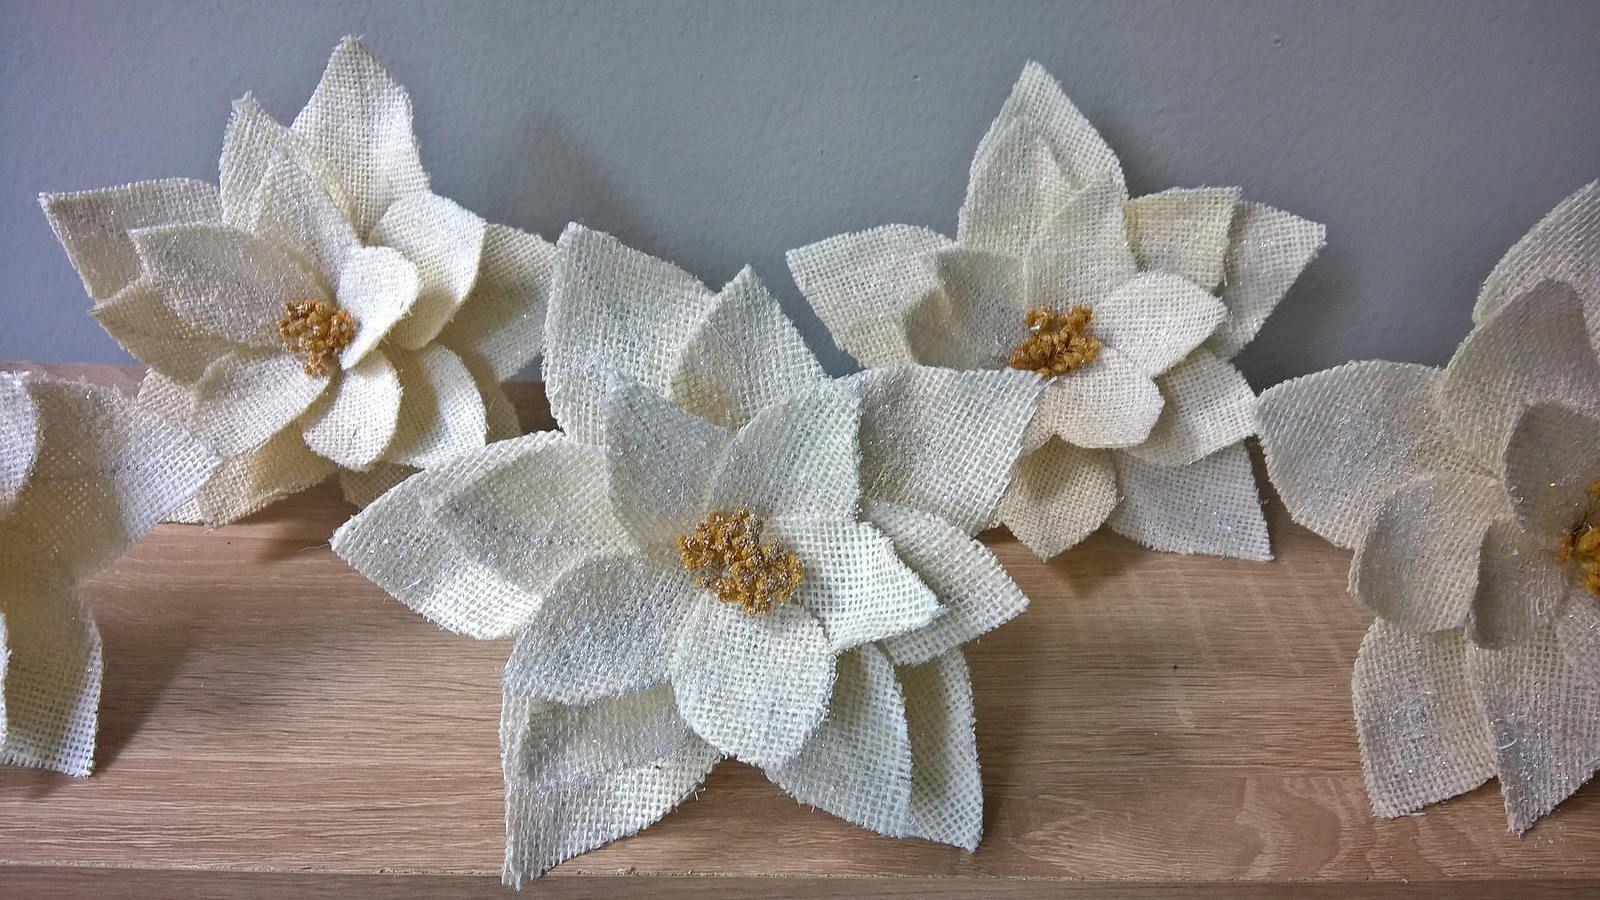 Artificial flowers outdoors artificial plants indoorartificial